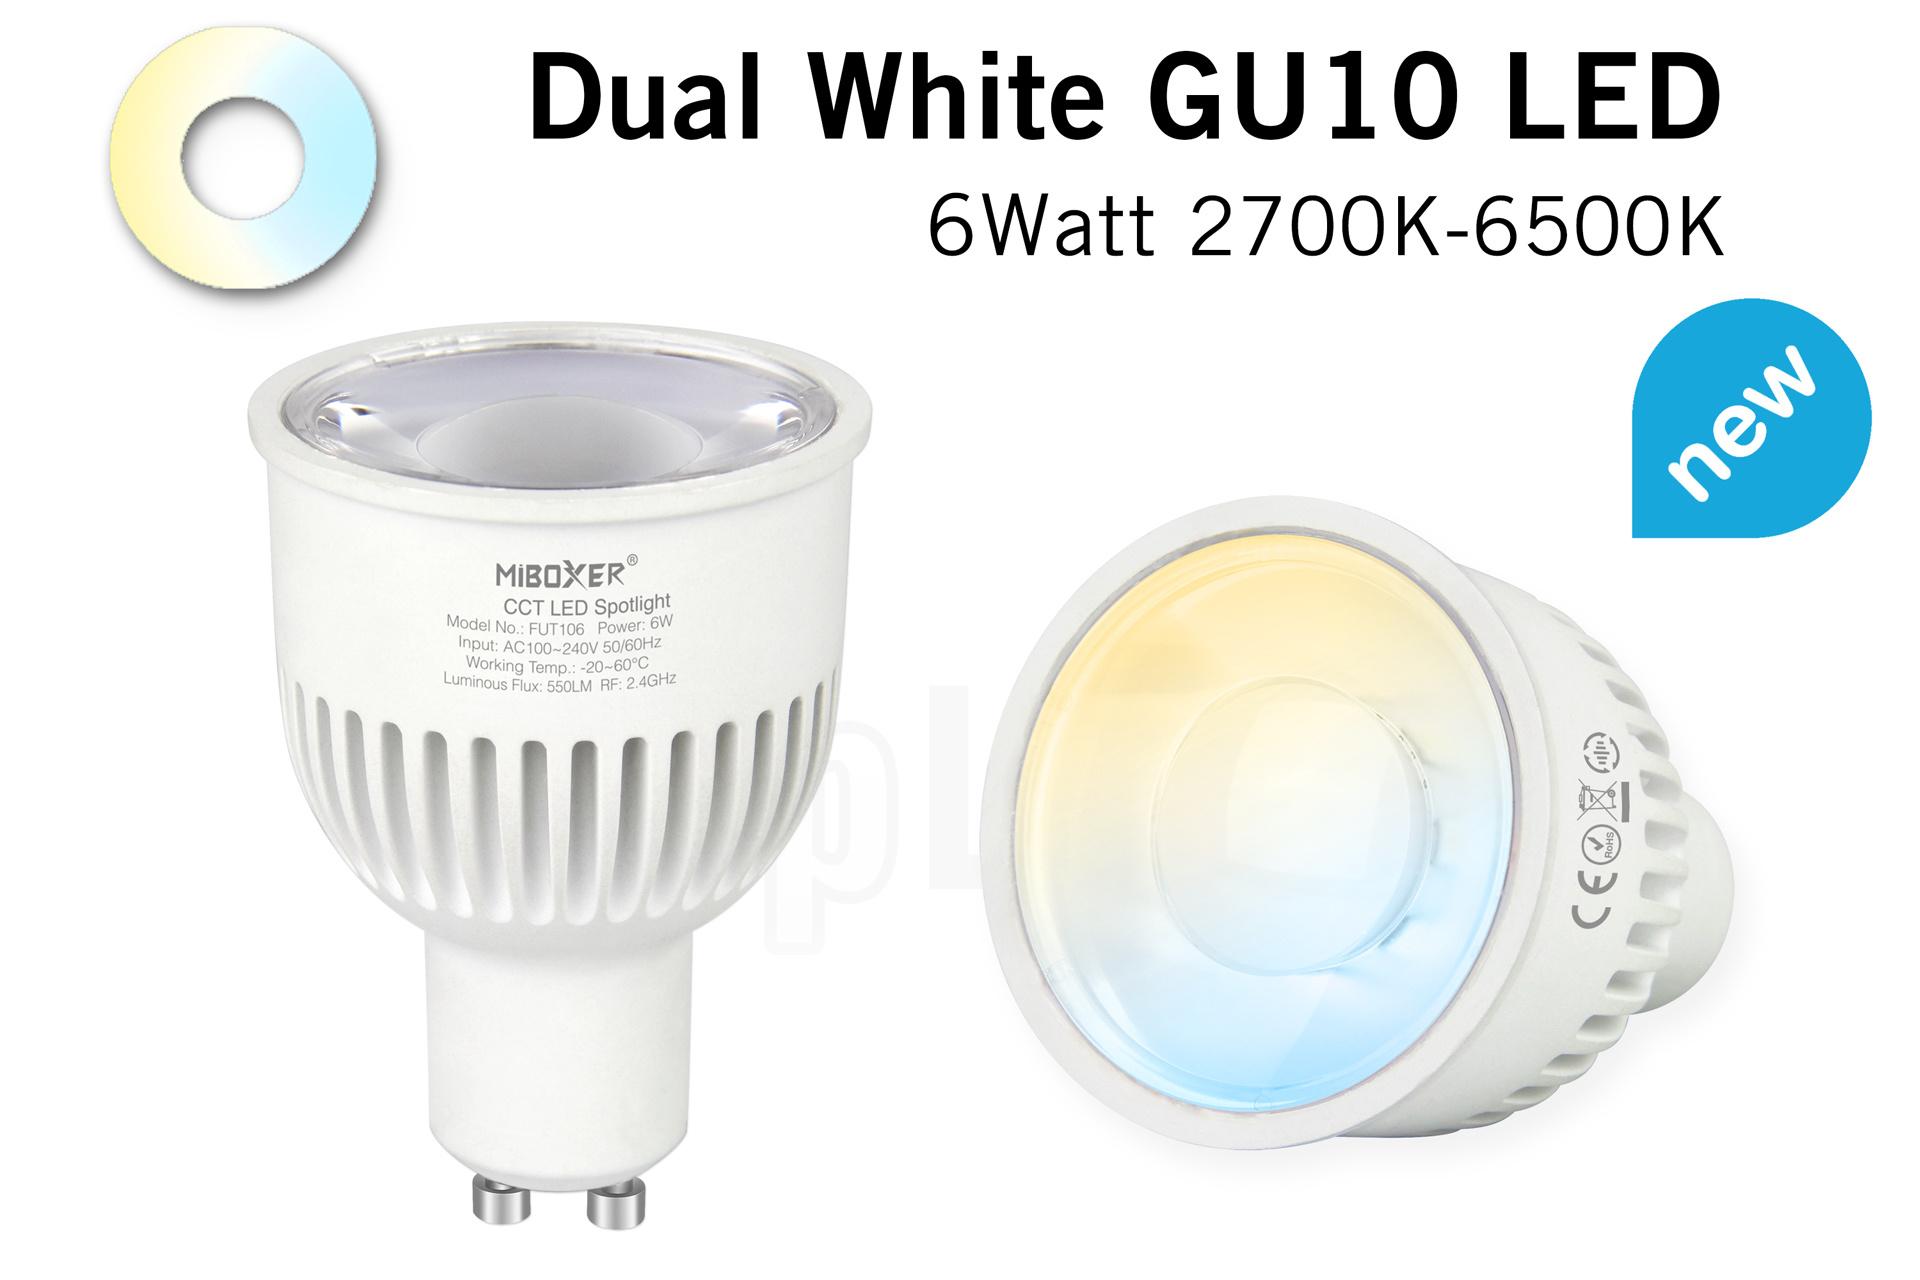 Mi-light 6W Dual White 220V GU10 LED Spot